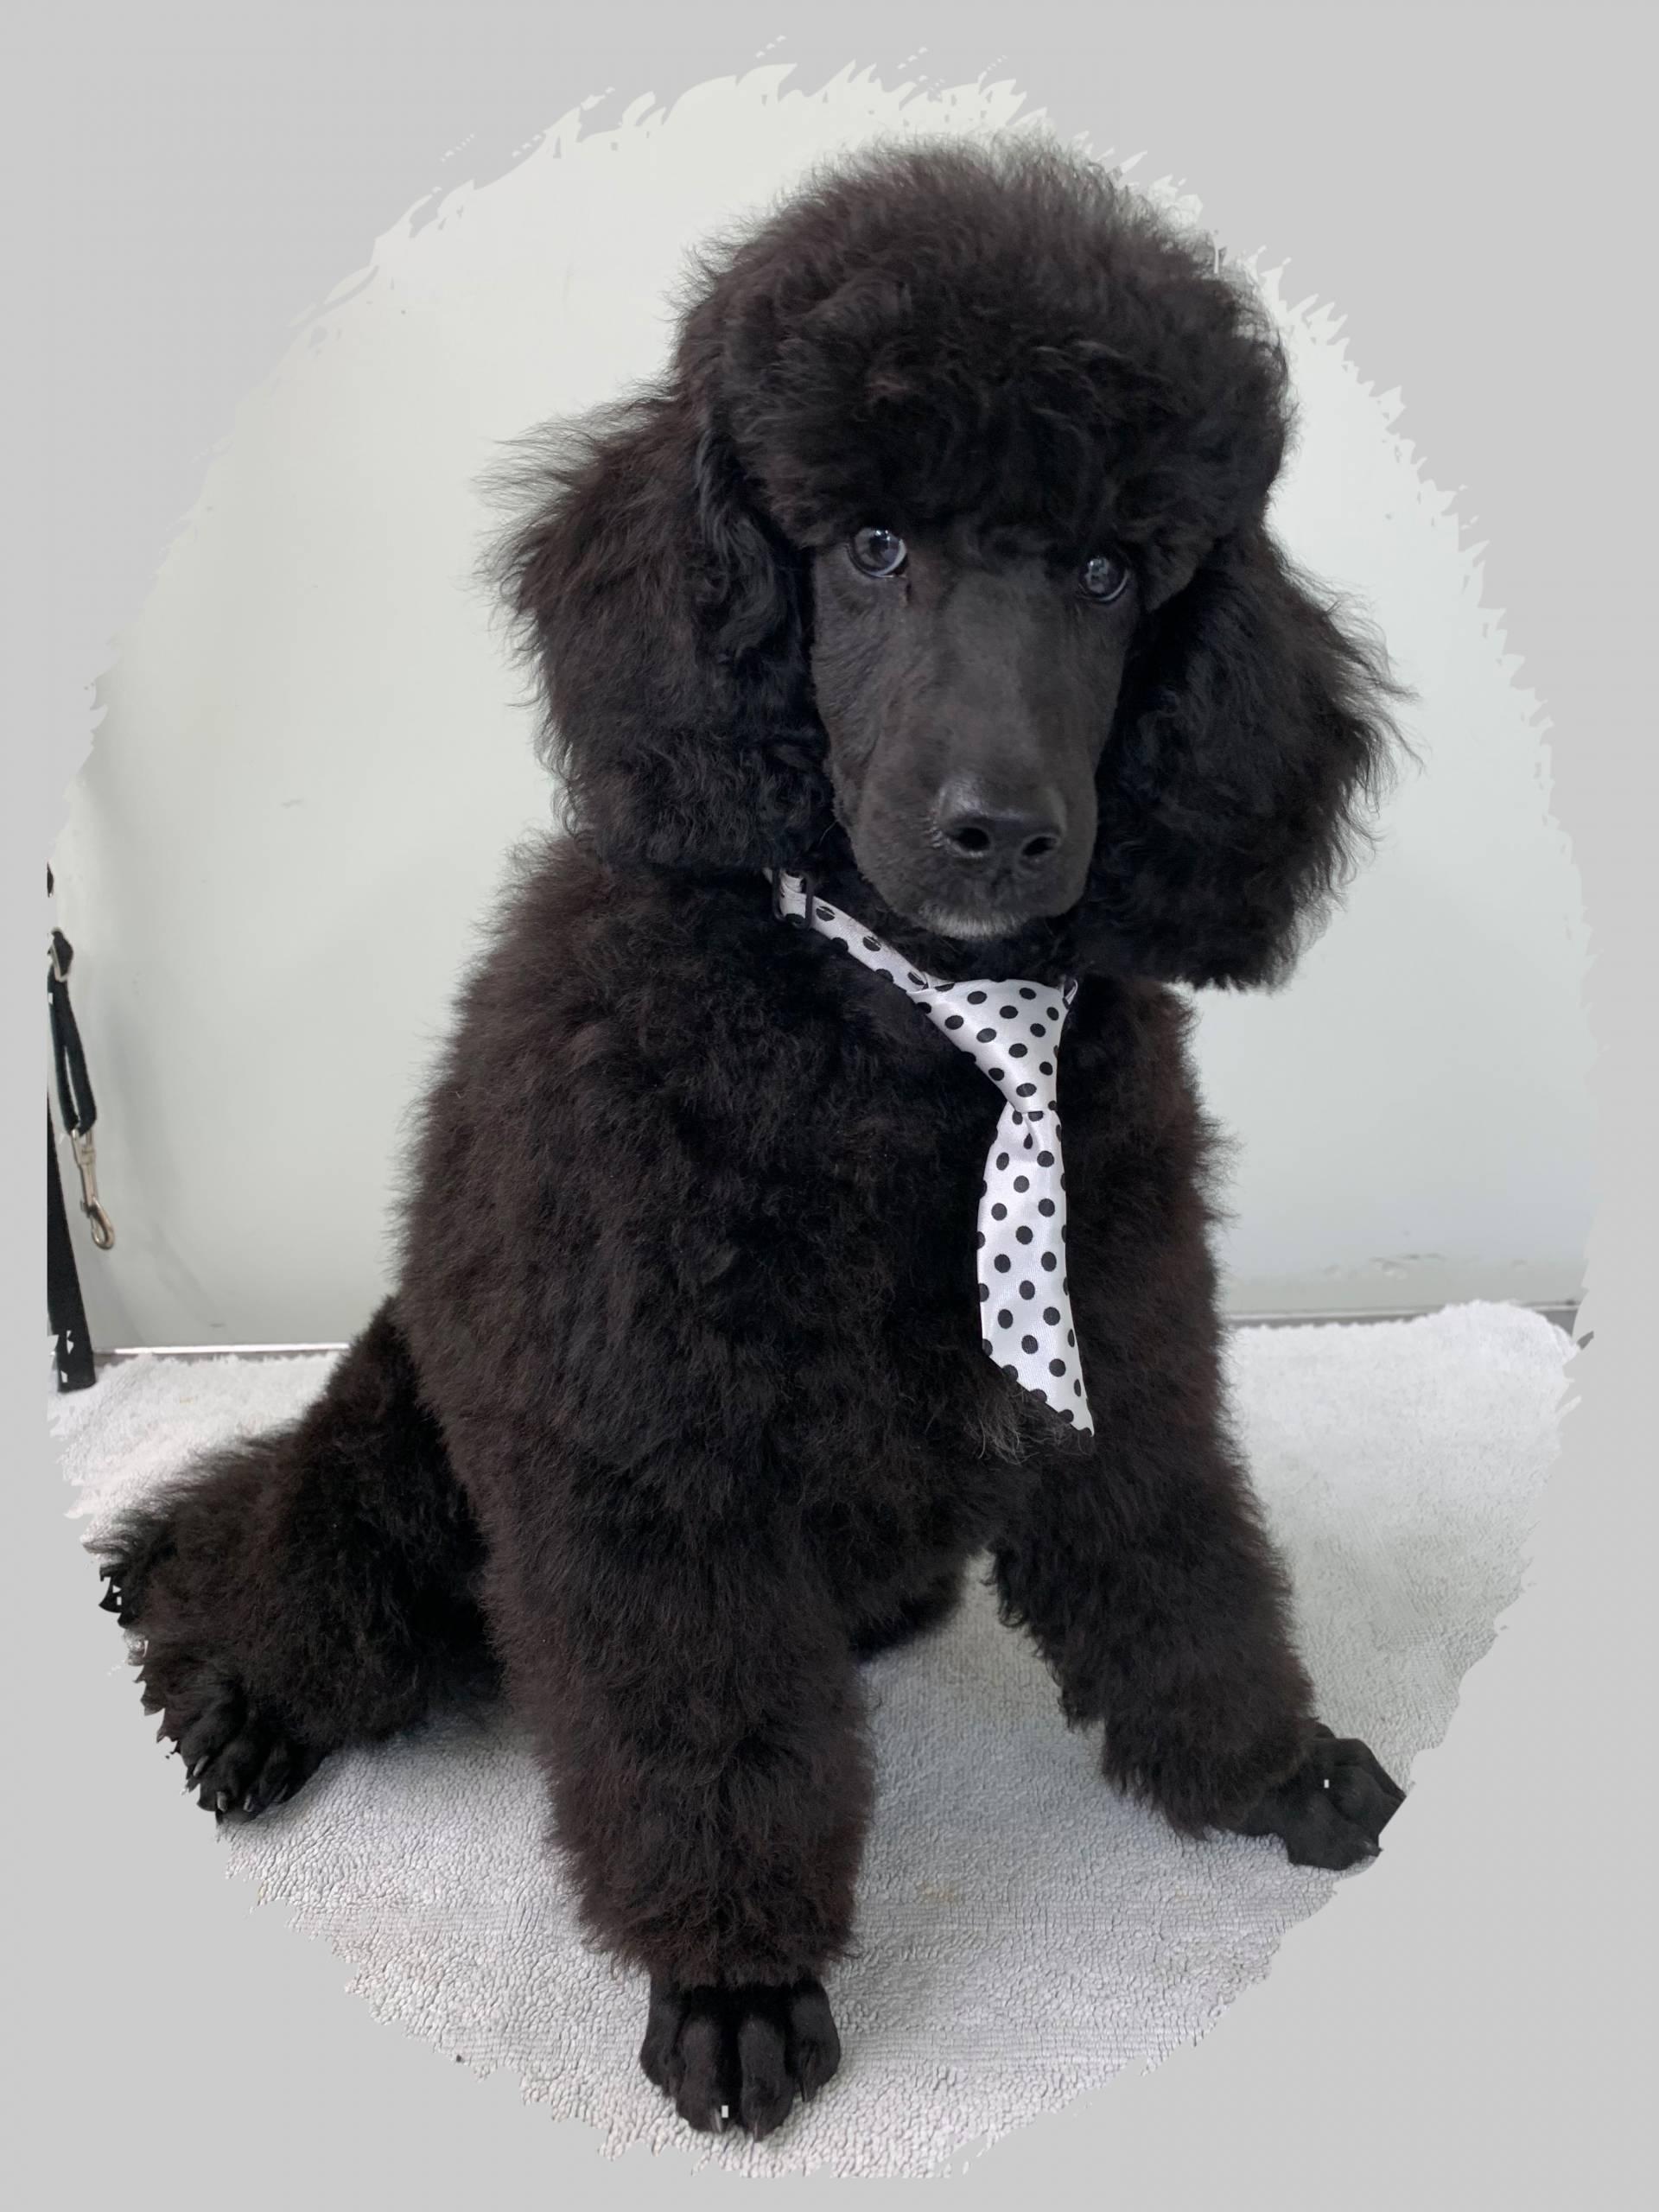 V.I.P. Puppy's